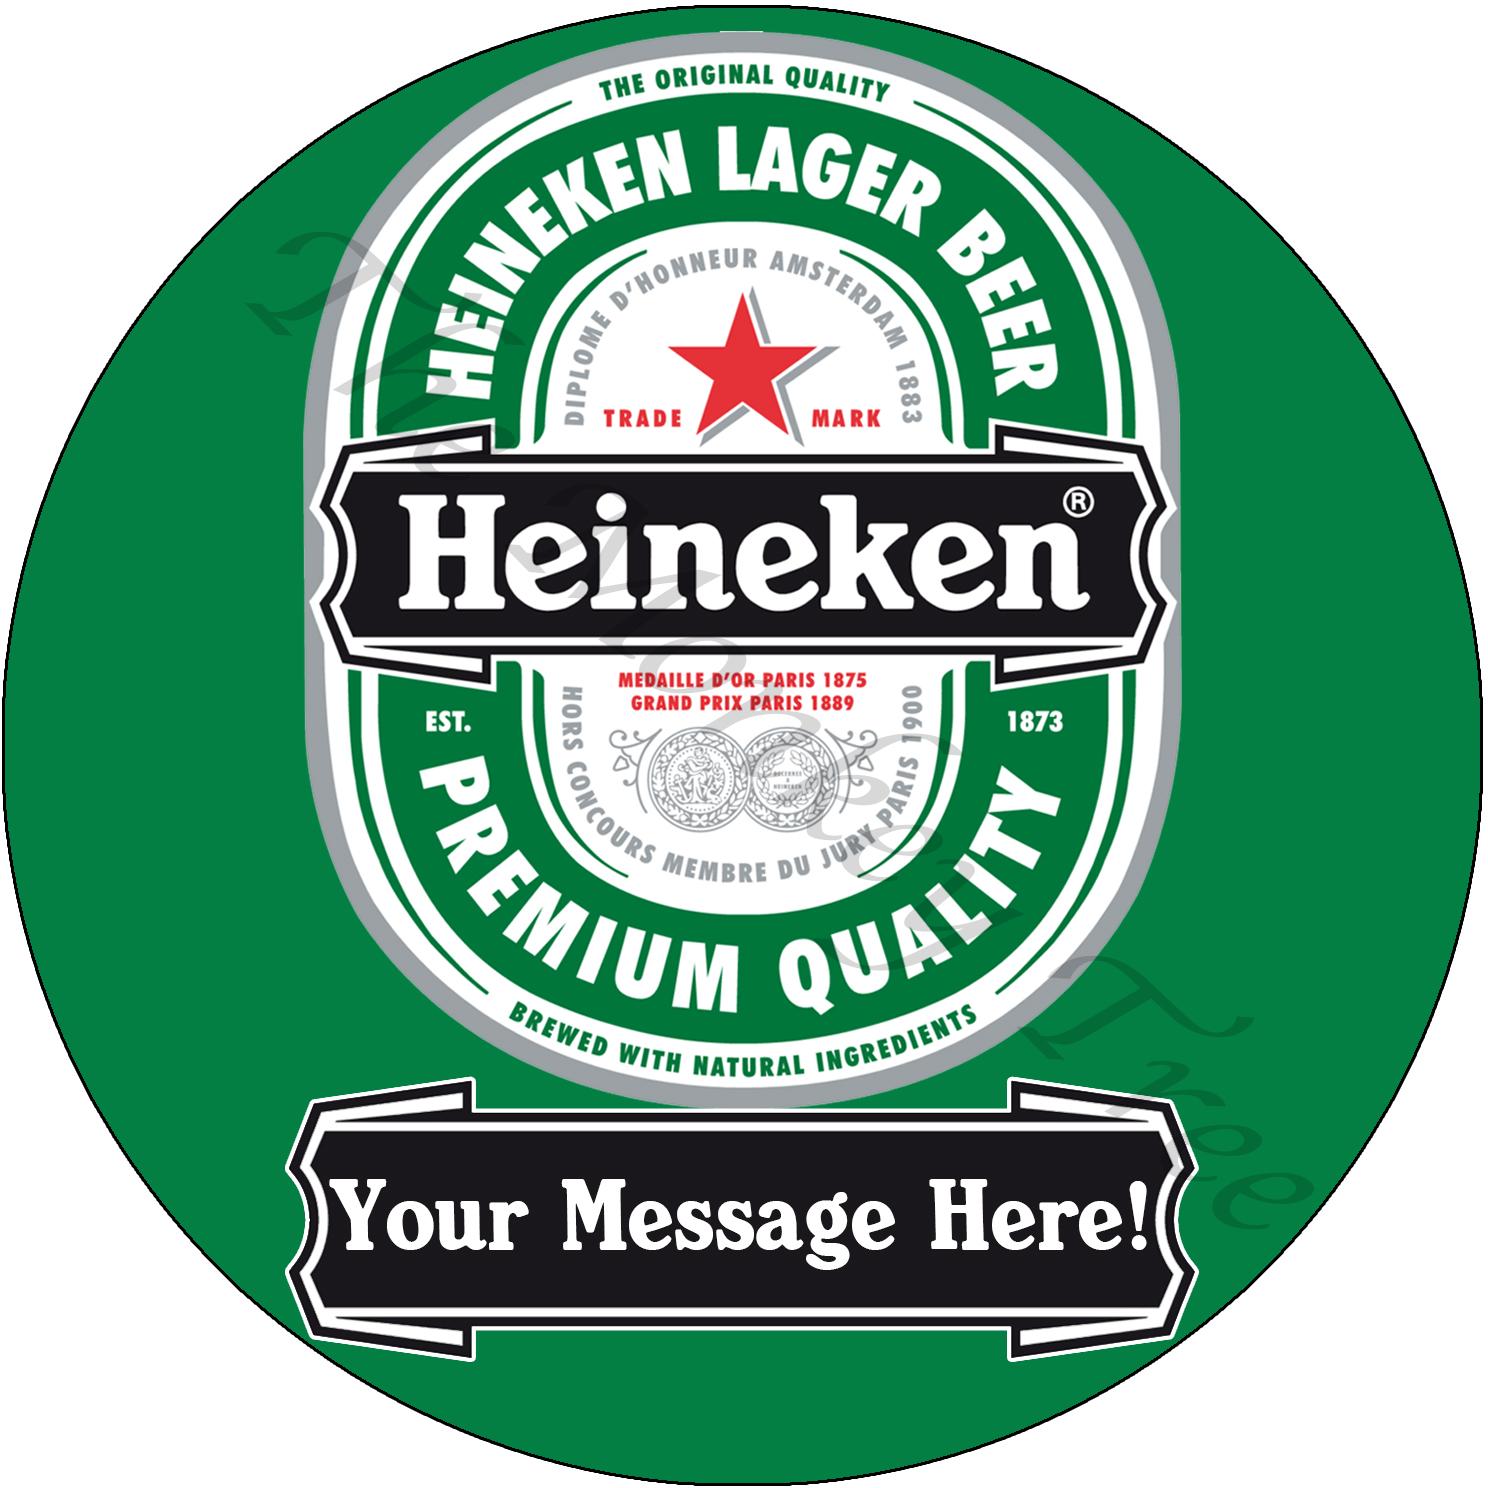 heineken logo images